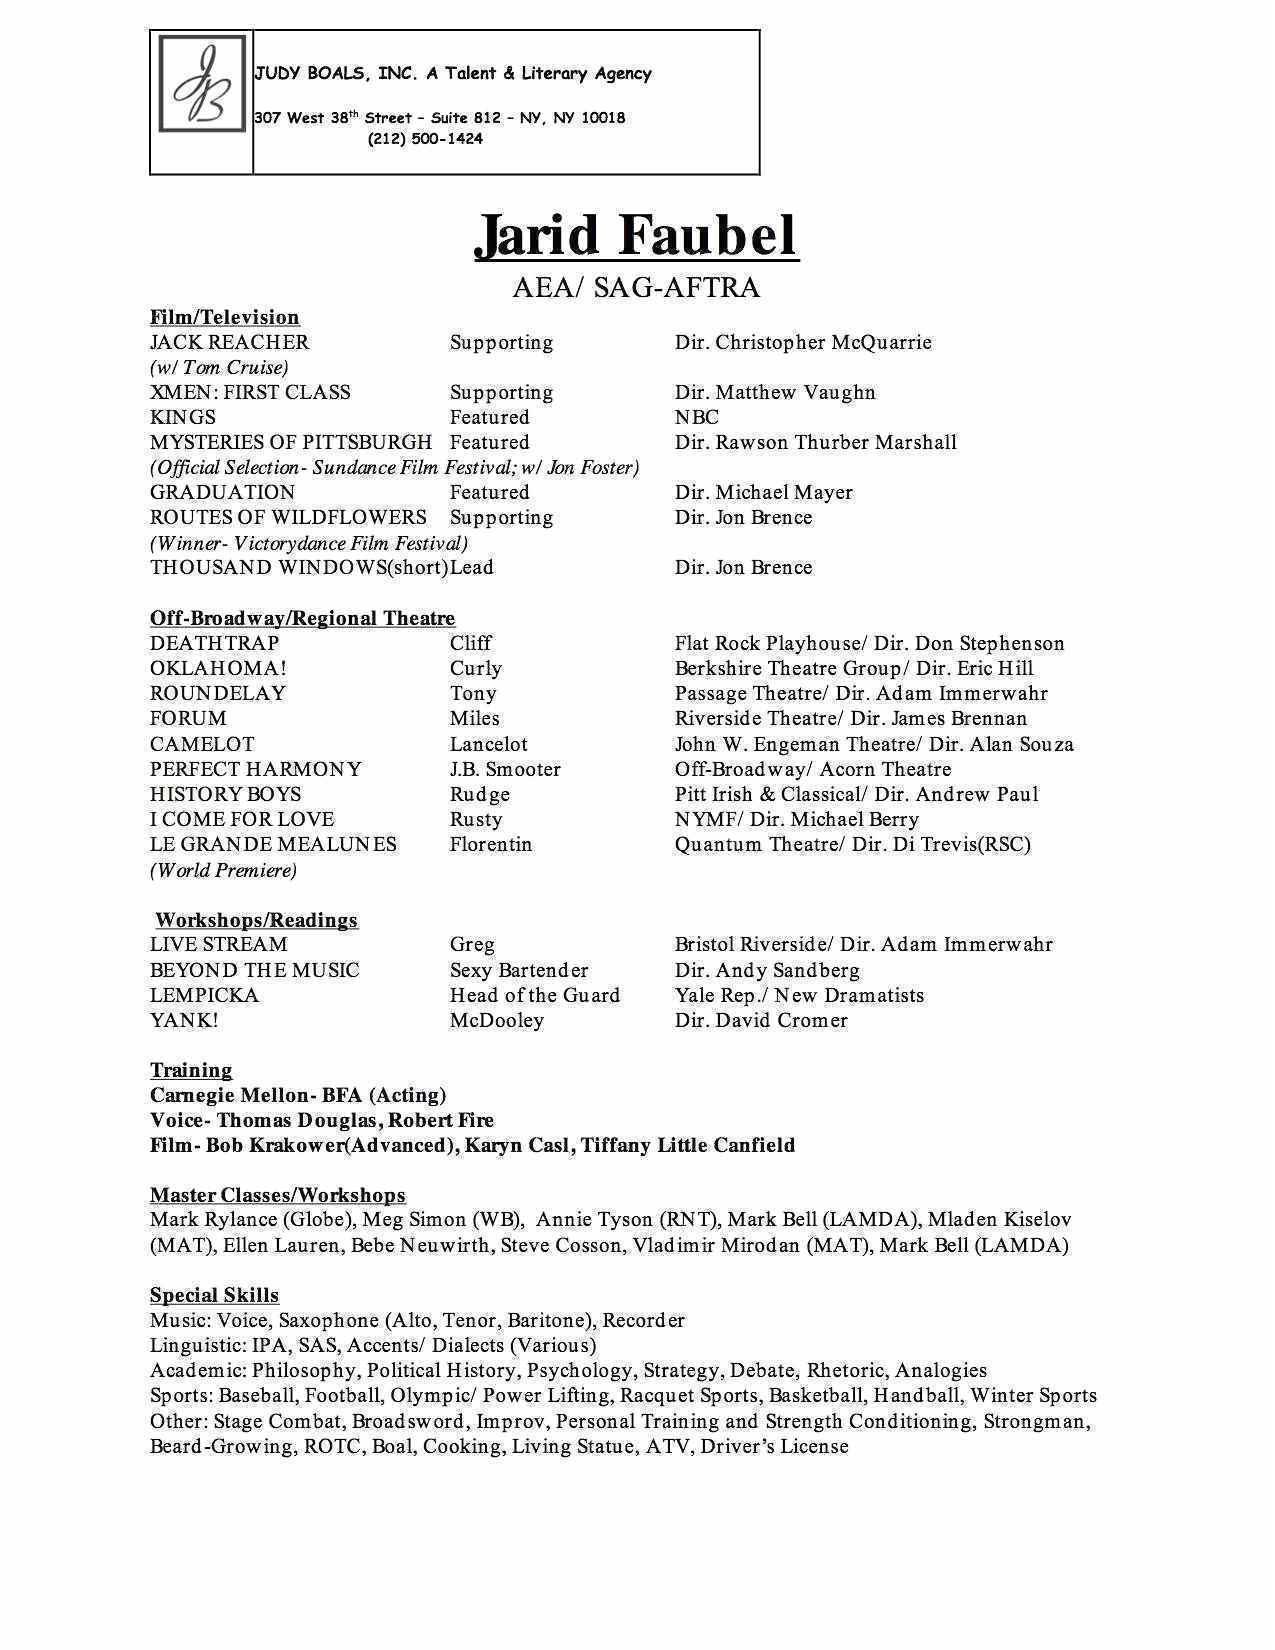 Yale Sample Resume 12 13 Yale Resume Template Lascazuelasphilly Com